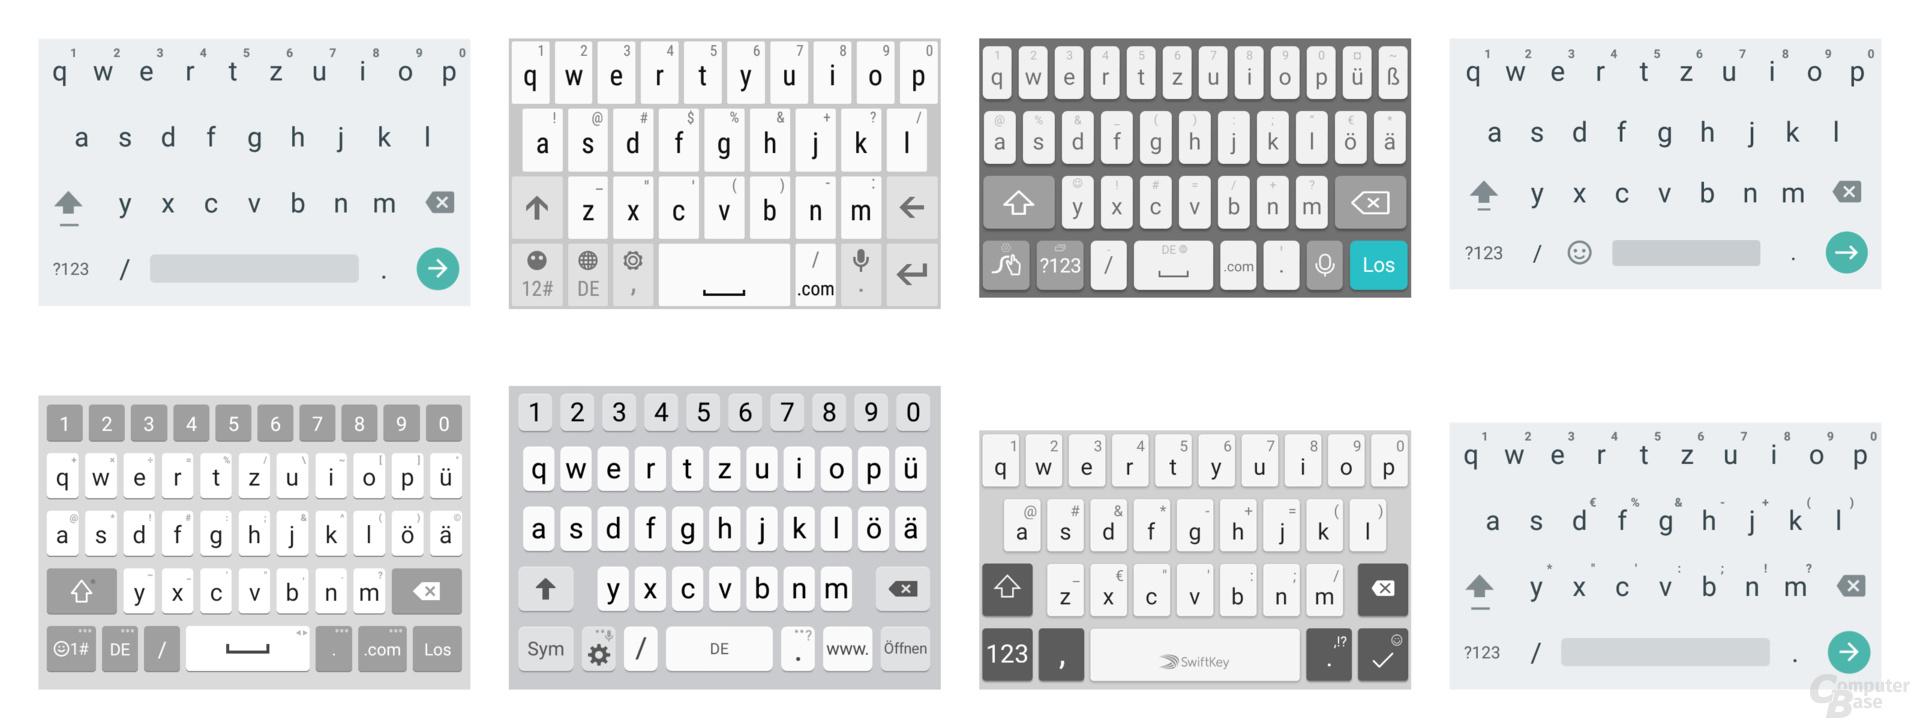 Tastaturen v.l.n.r.: Gigaset, HTC, Huawei, Lenovo, LG, Samsung, Sony, Wileyfox